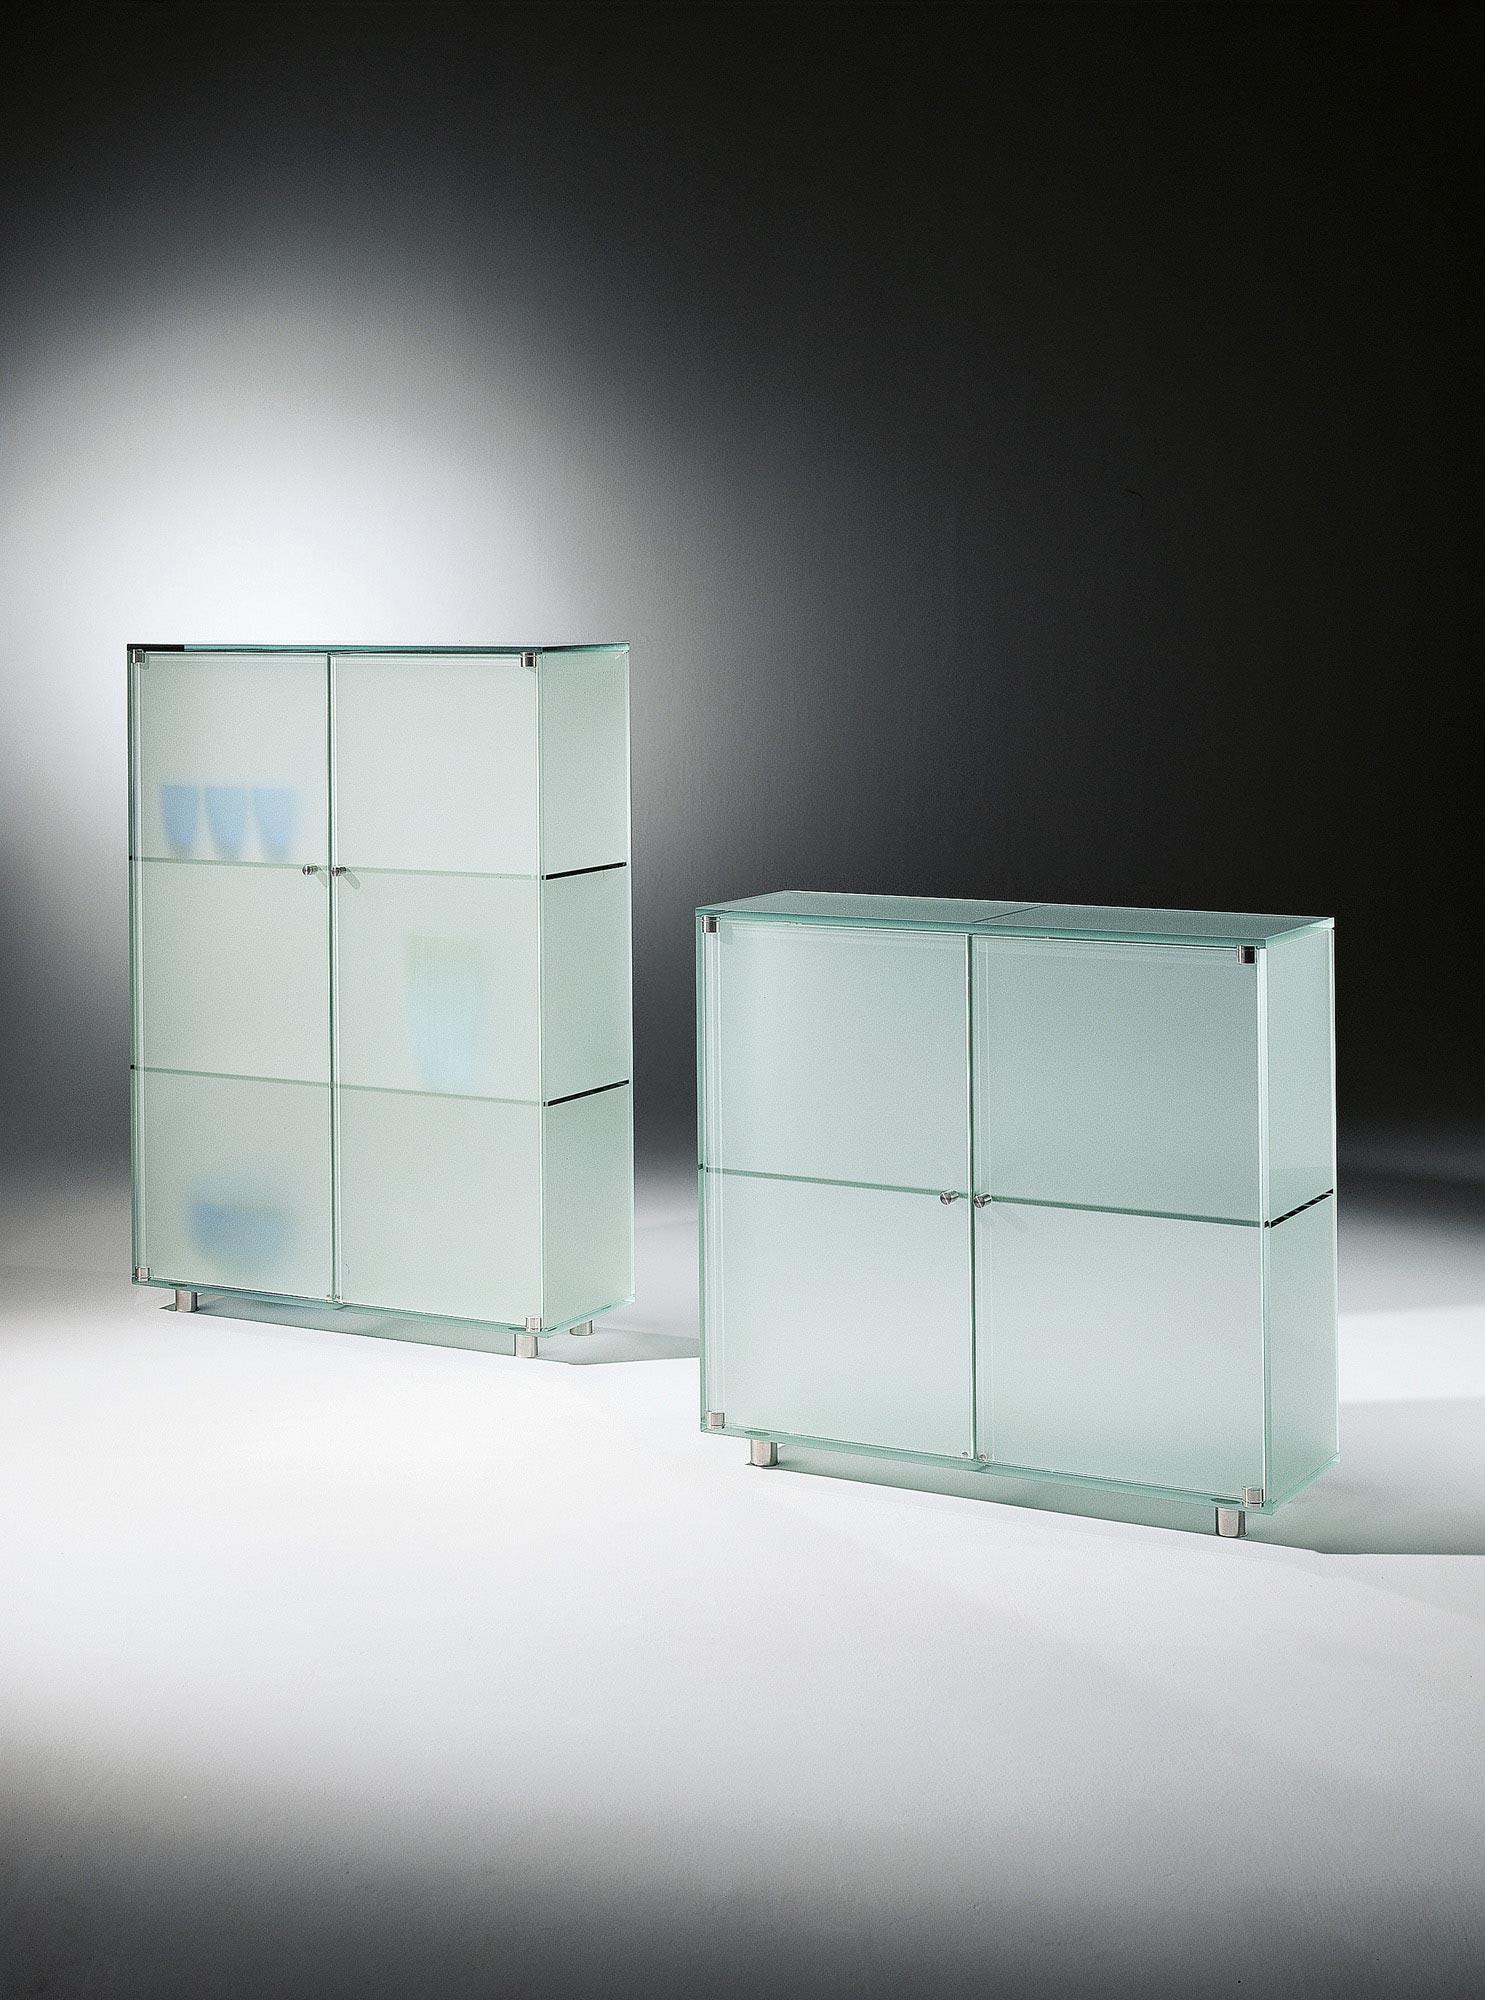 Buy High Quality Glass Showcase From Dreieck Design Shine